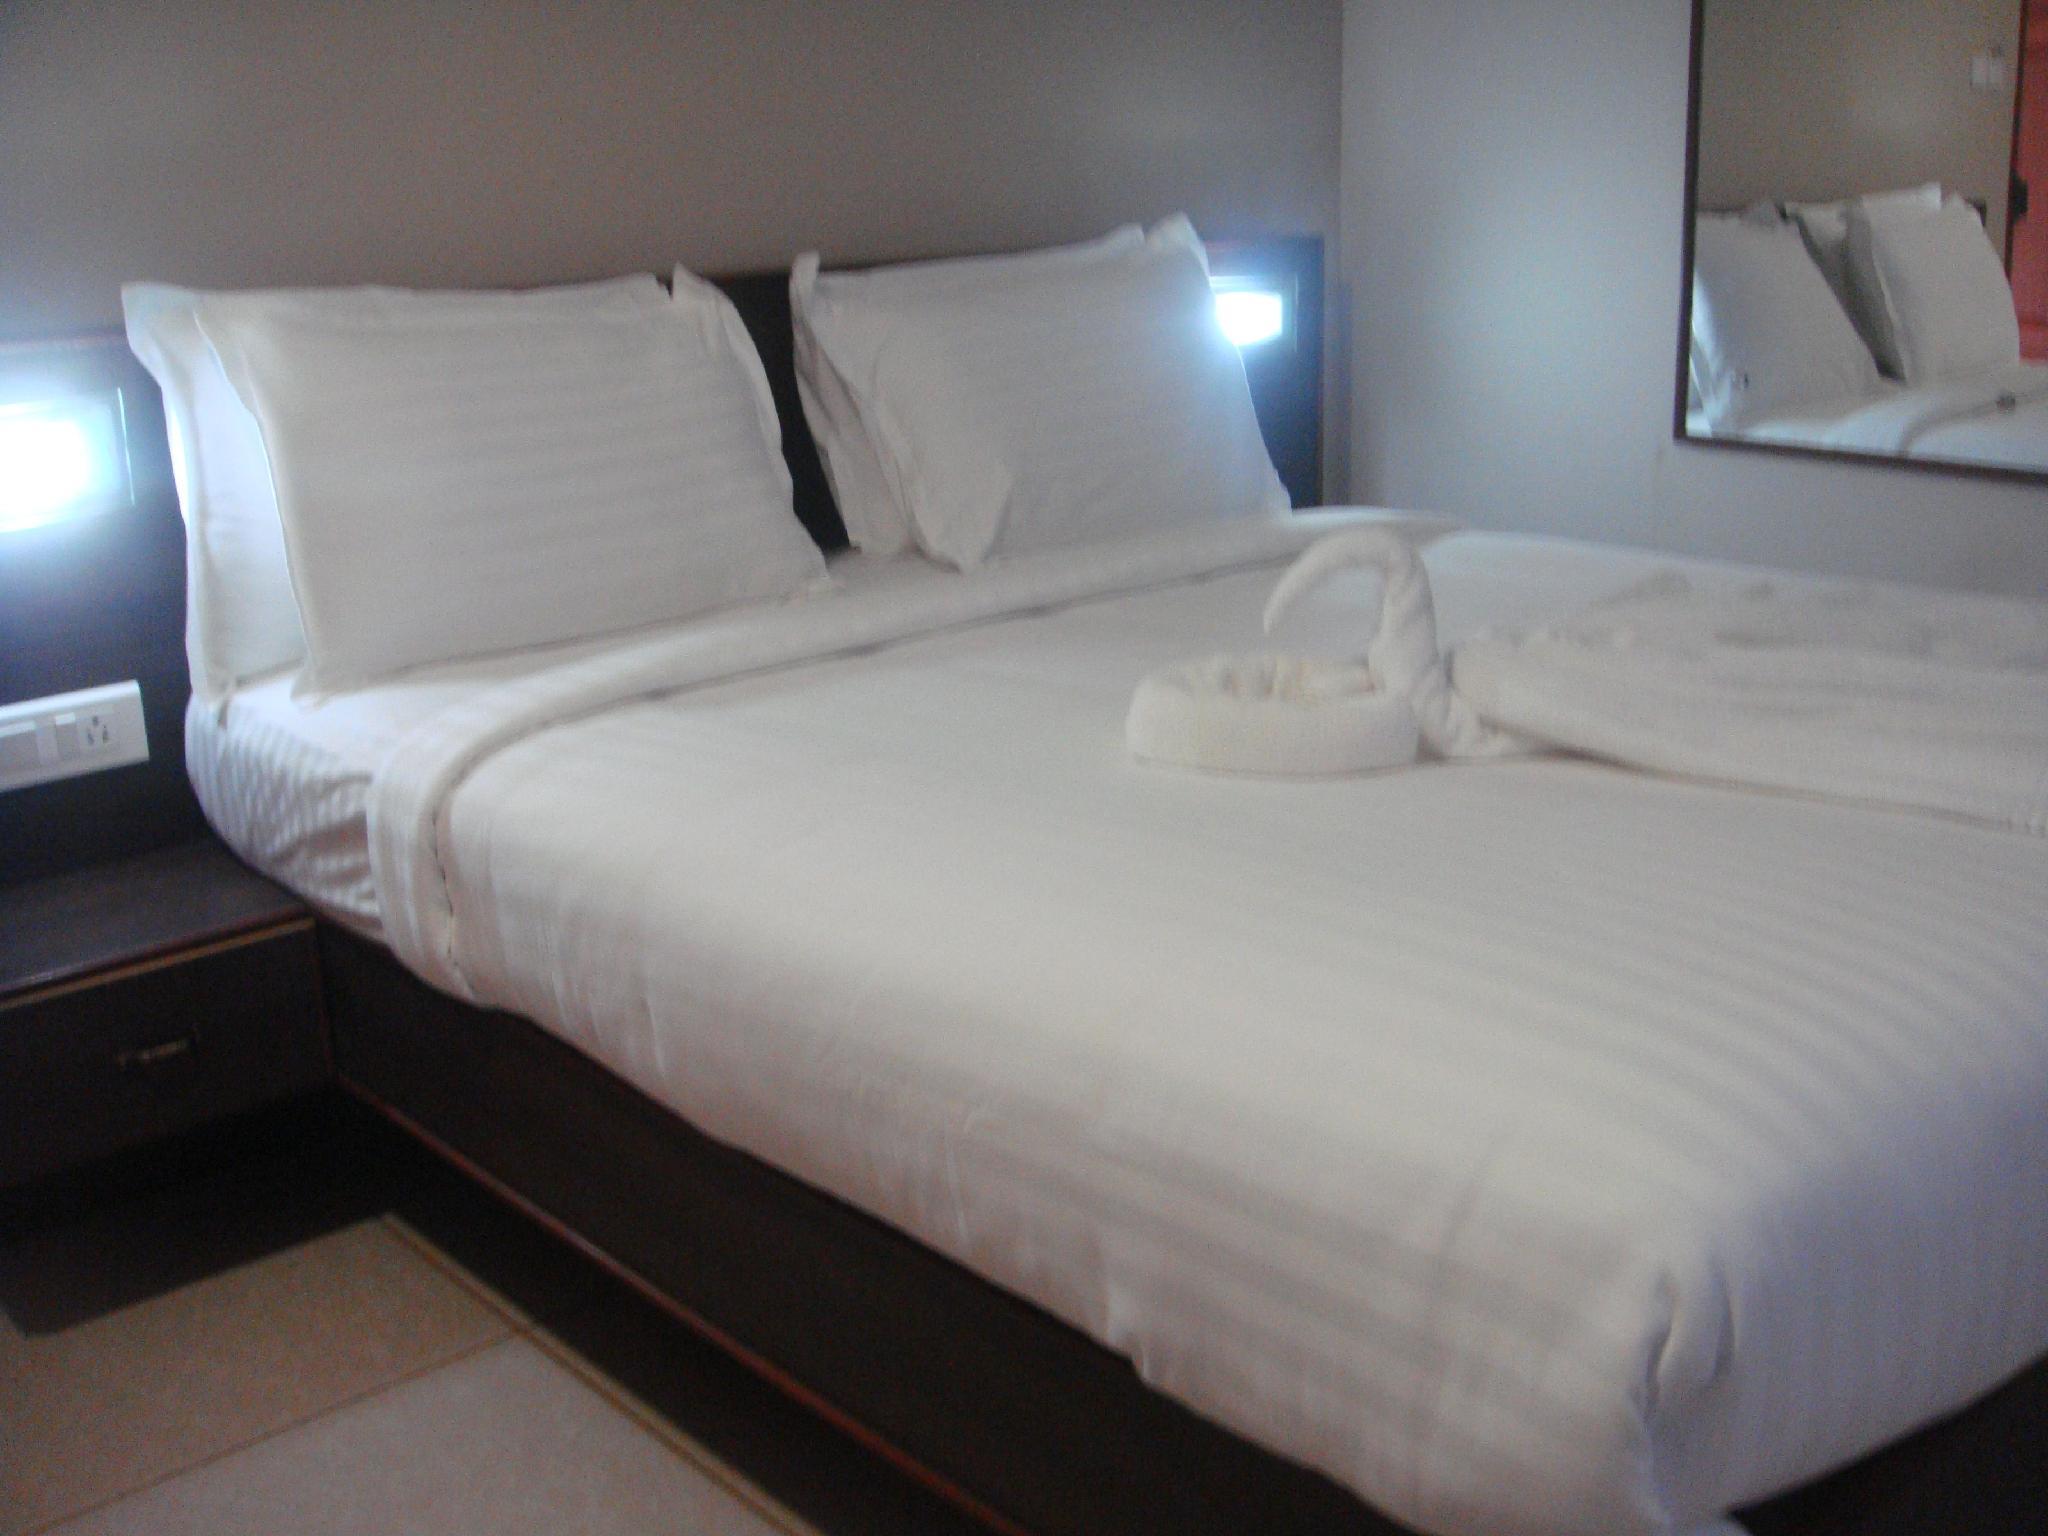 Beith Hotel - Kochi / Cochin